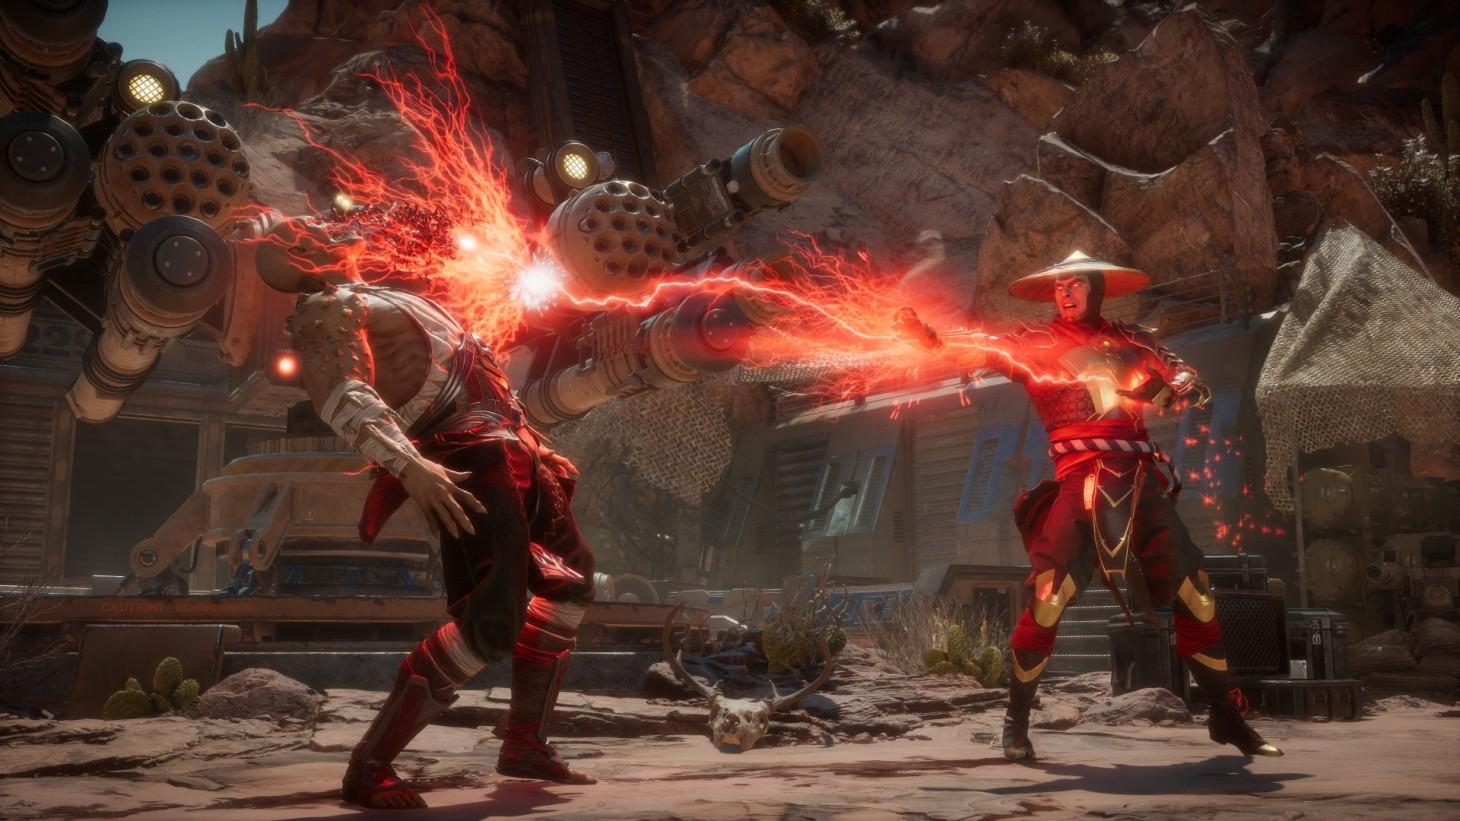 Mortal Kombat 11 - بهترین بازی های ps4